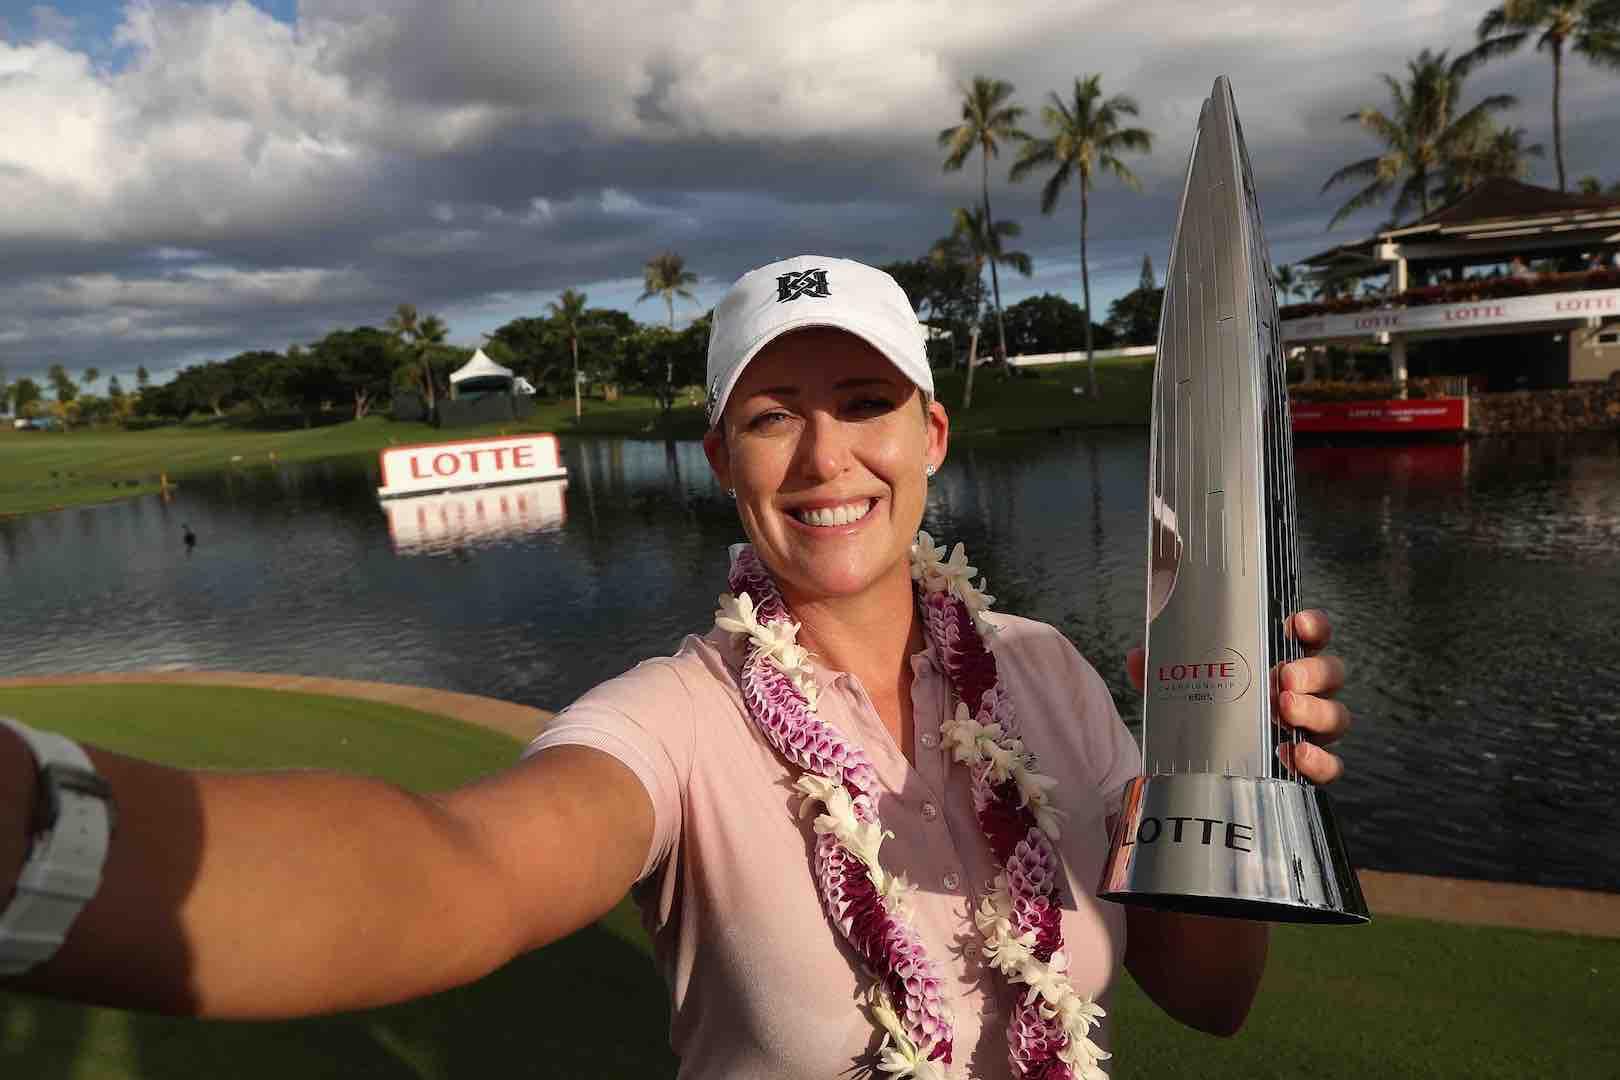 Cristie Kerr wins the LOTTE Championship